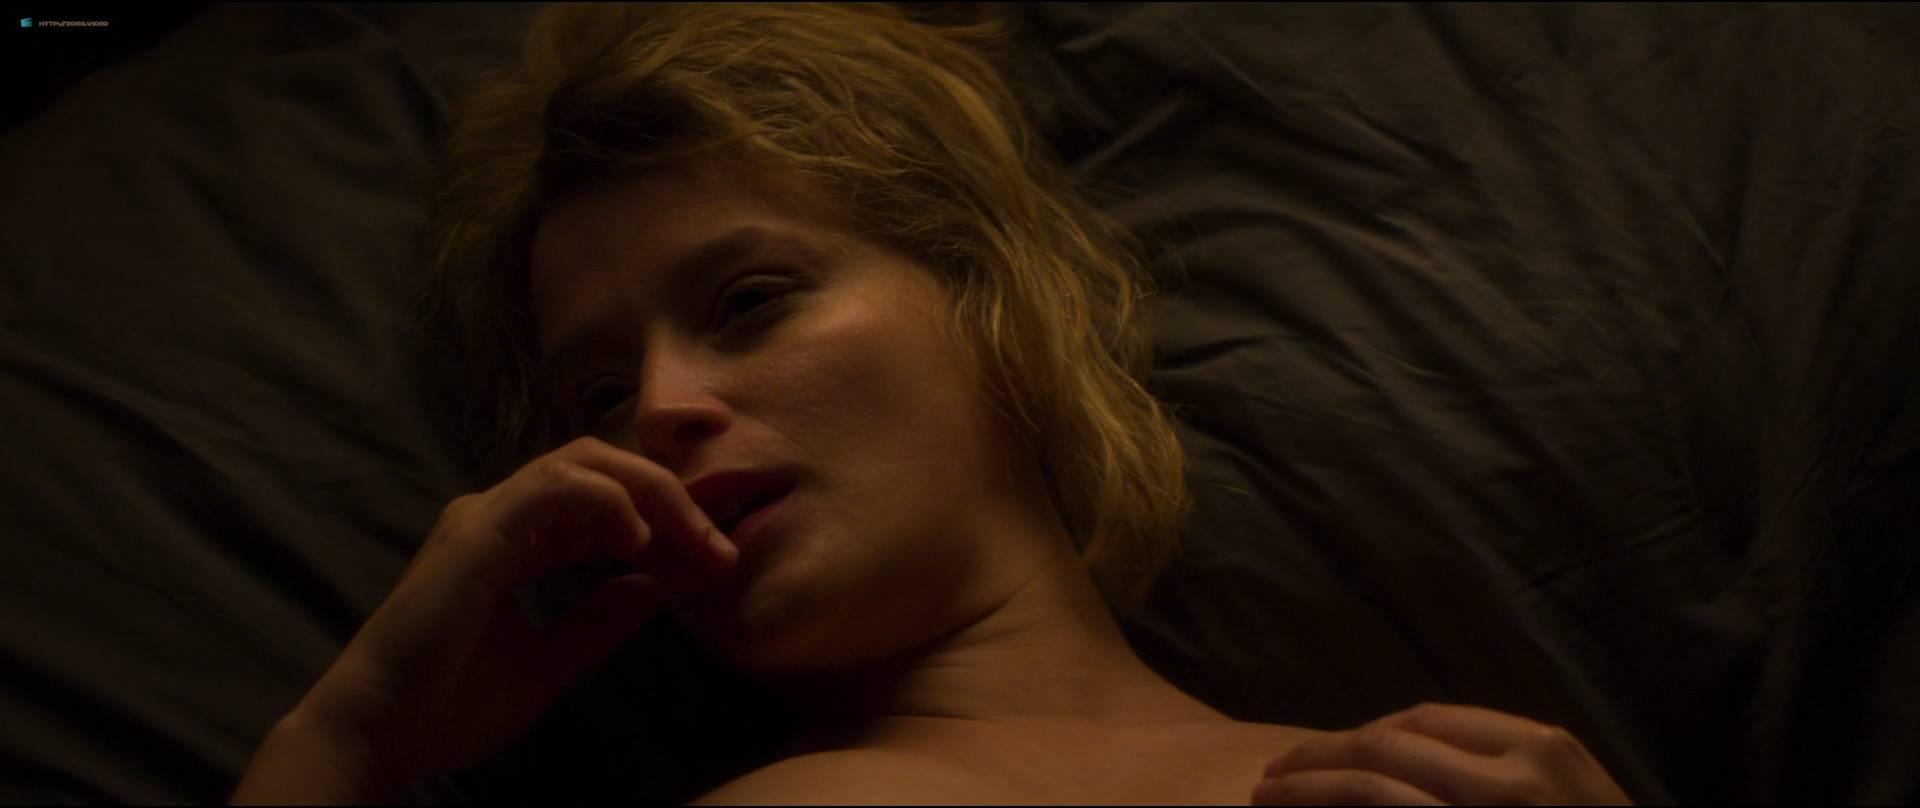 adeline-d-hermy-nude-bush-and-boobs-maryline-fr-2017-hd-1080p-bluray-007.jpg